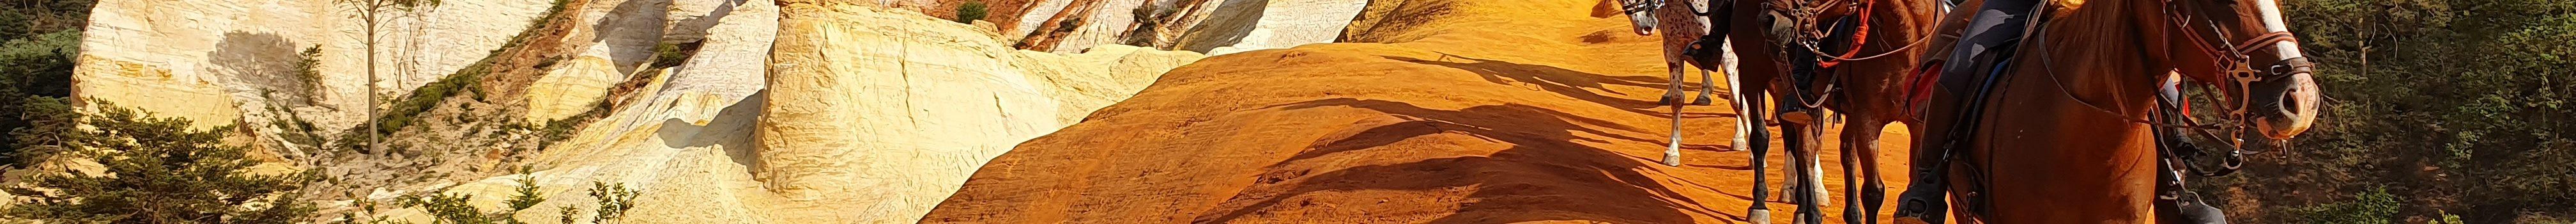 rando cheval colorado provence